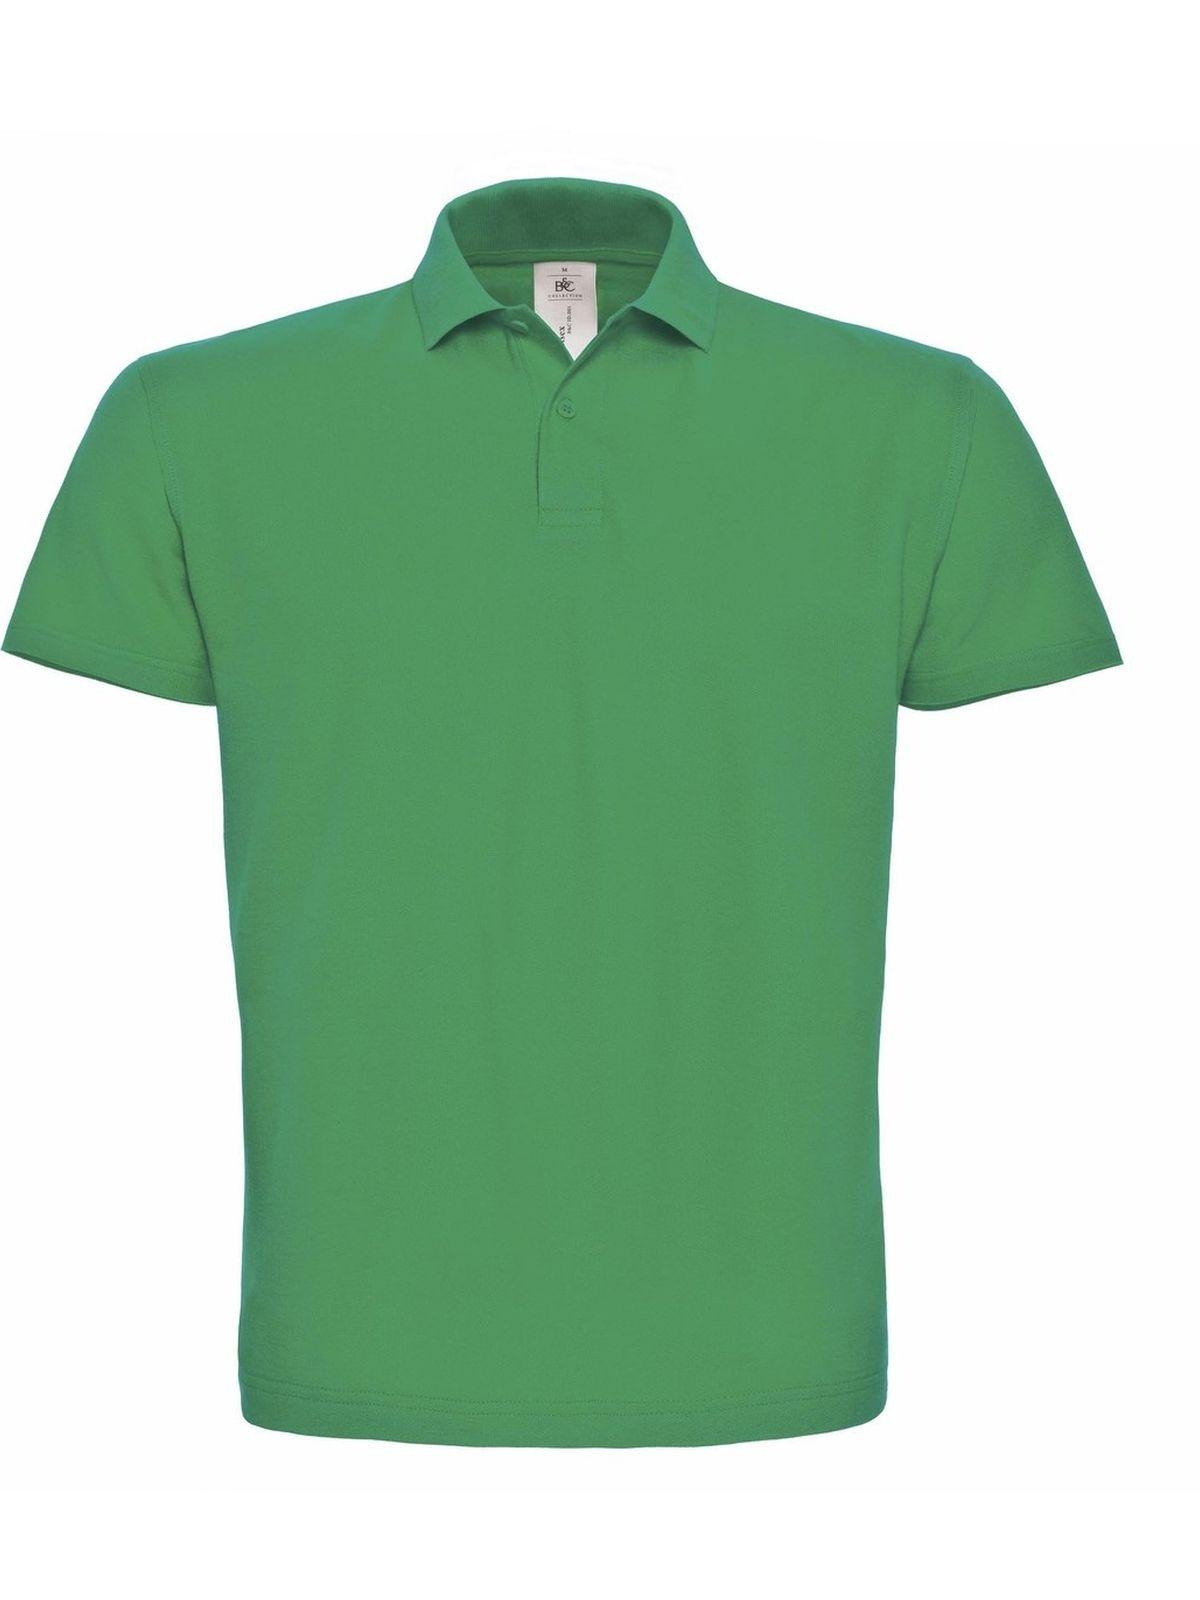 KG520 | kelly green